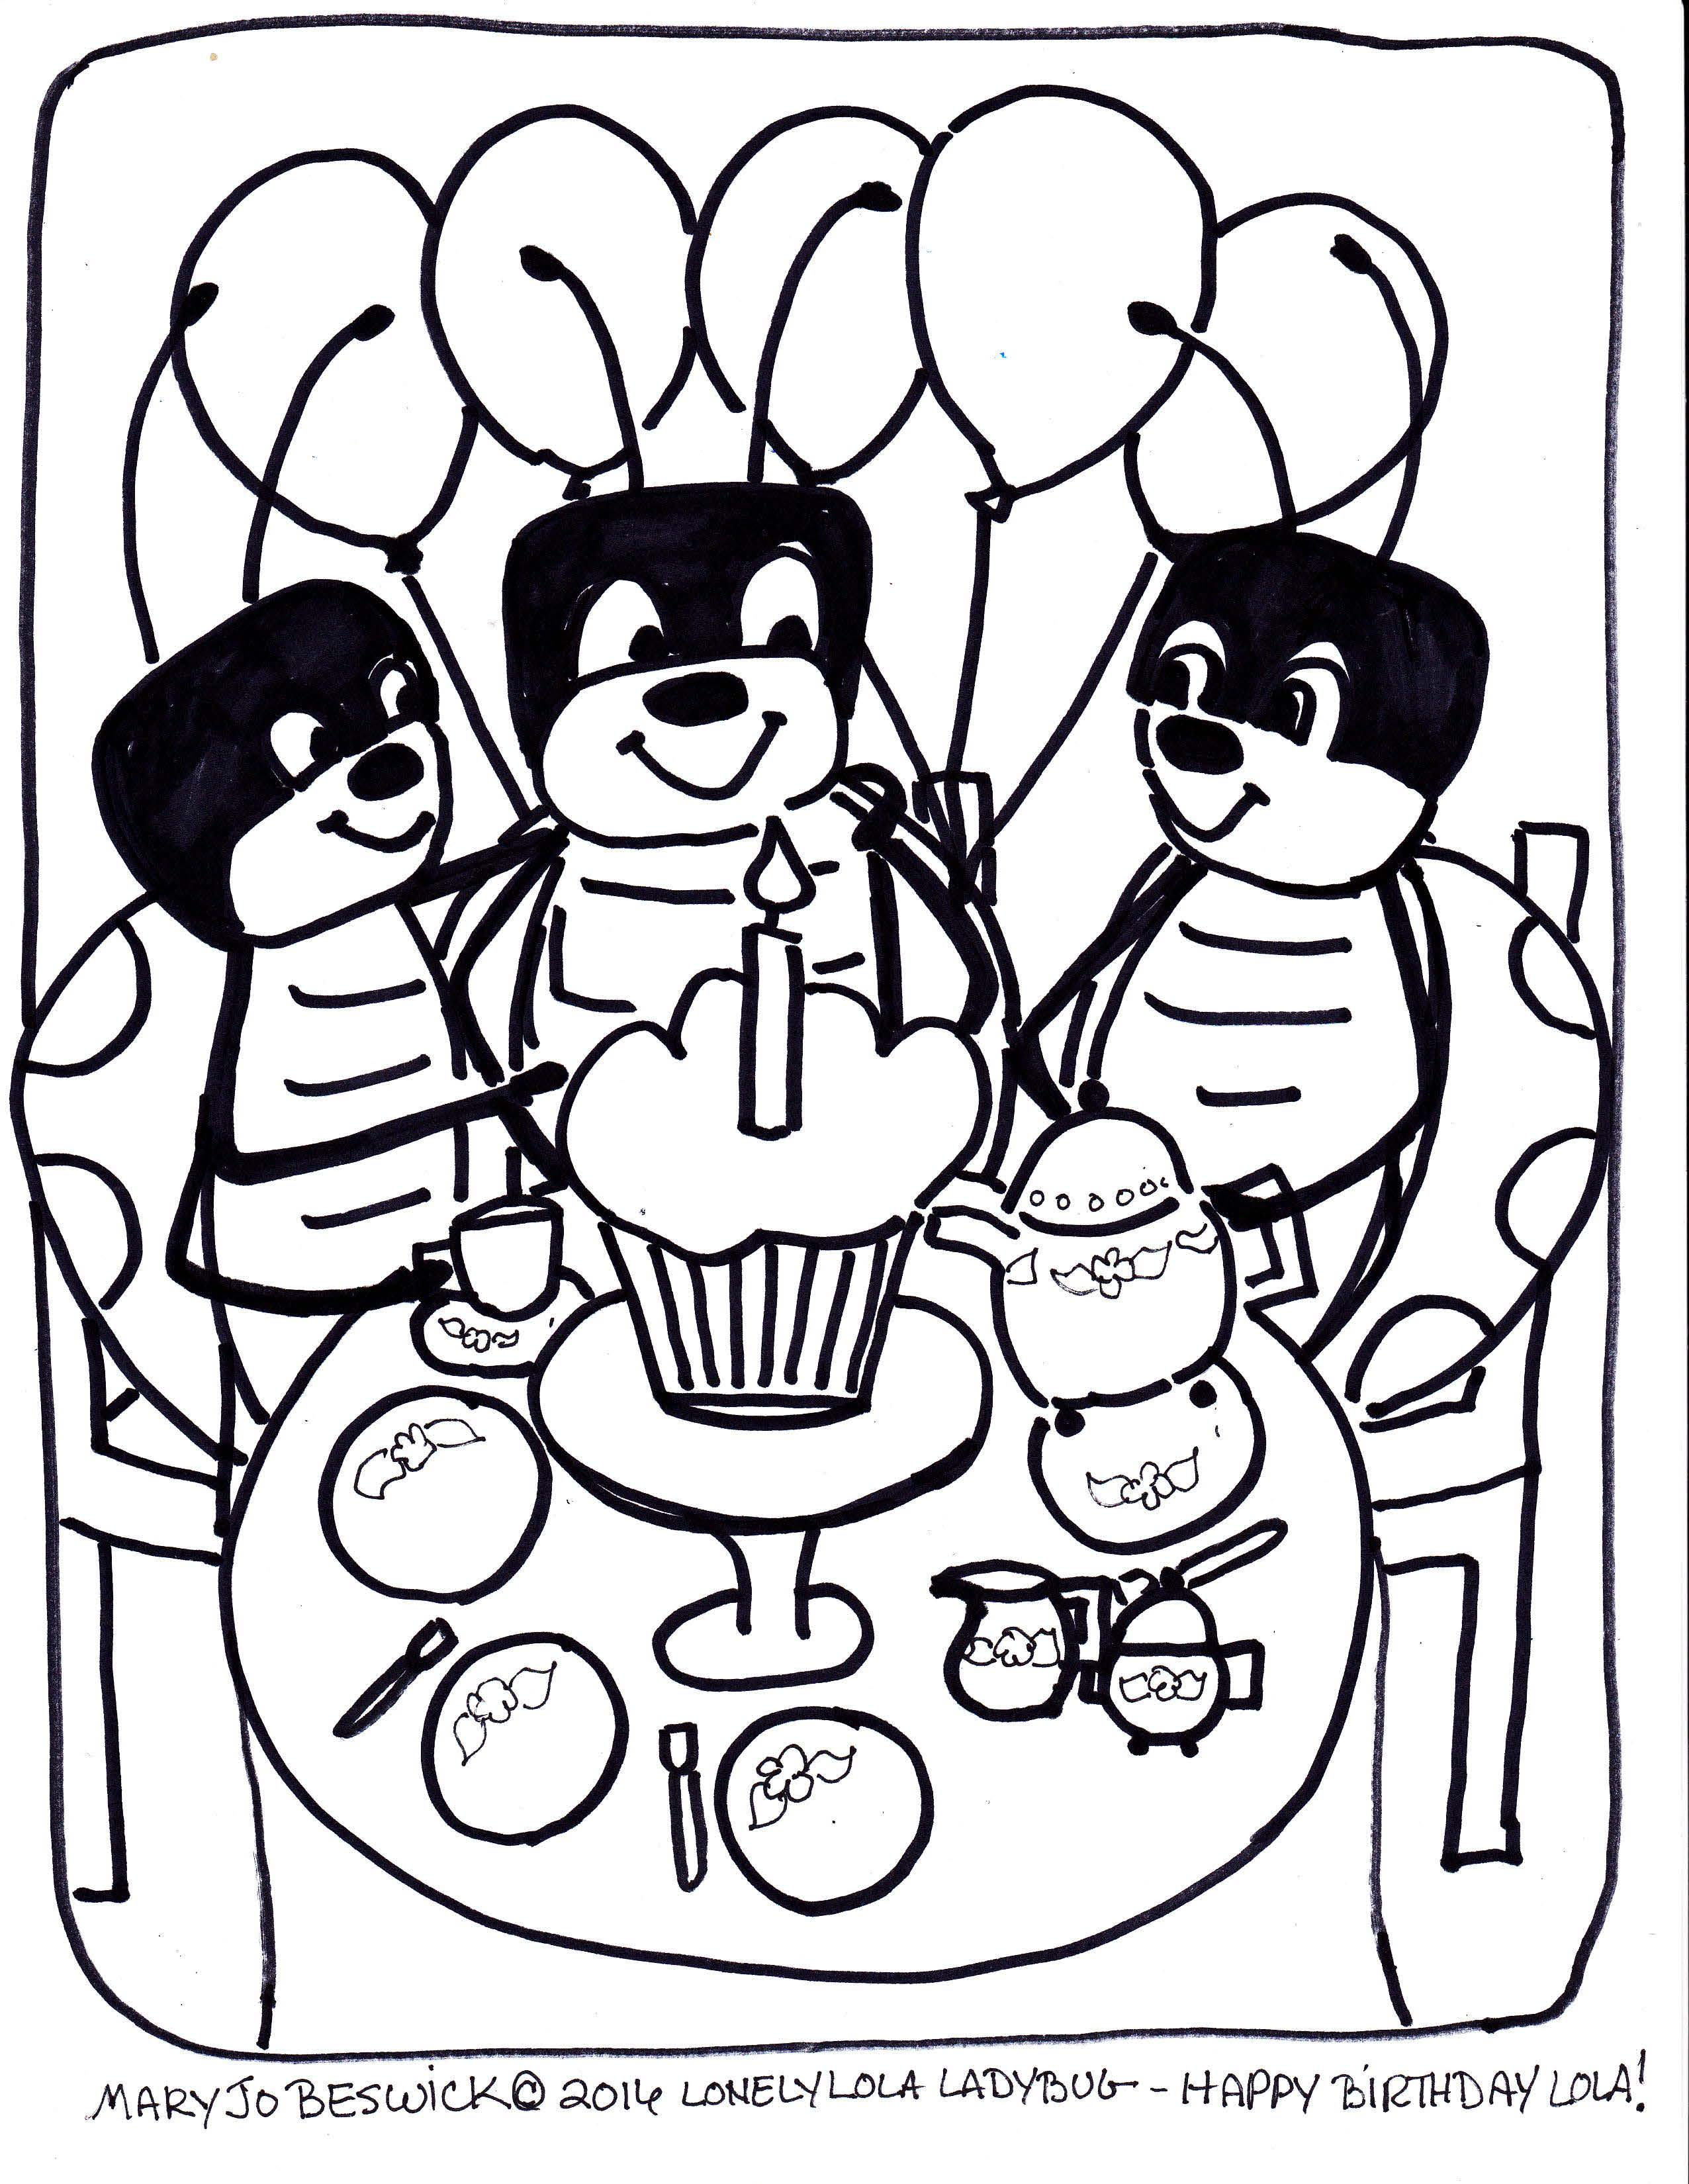 lola ladybug free coloring page birthday mary jo beswick